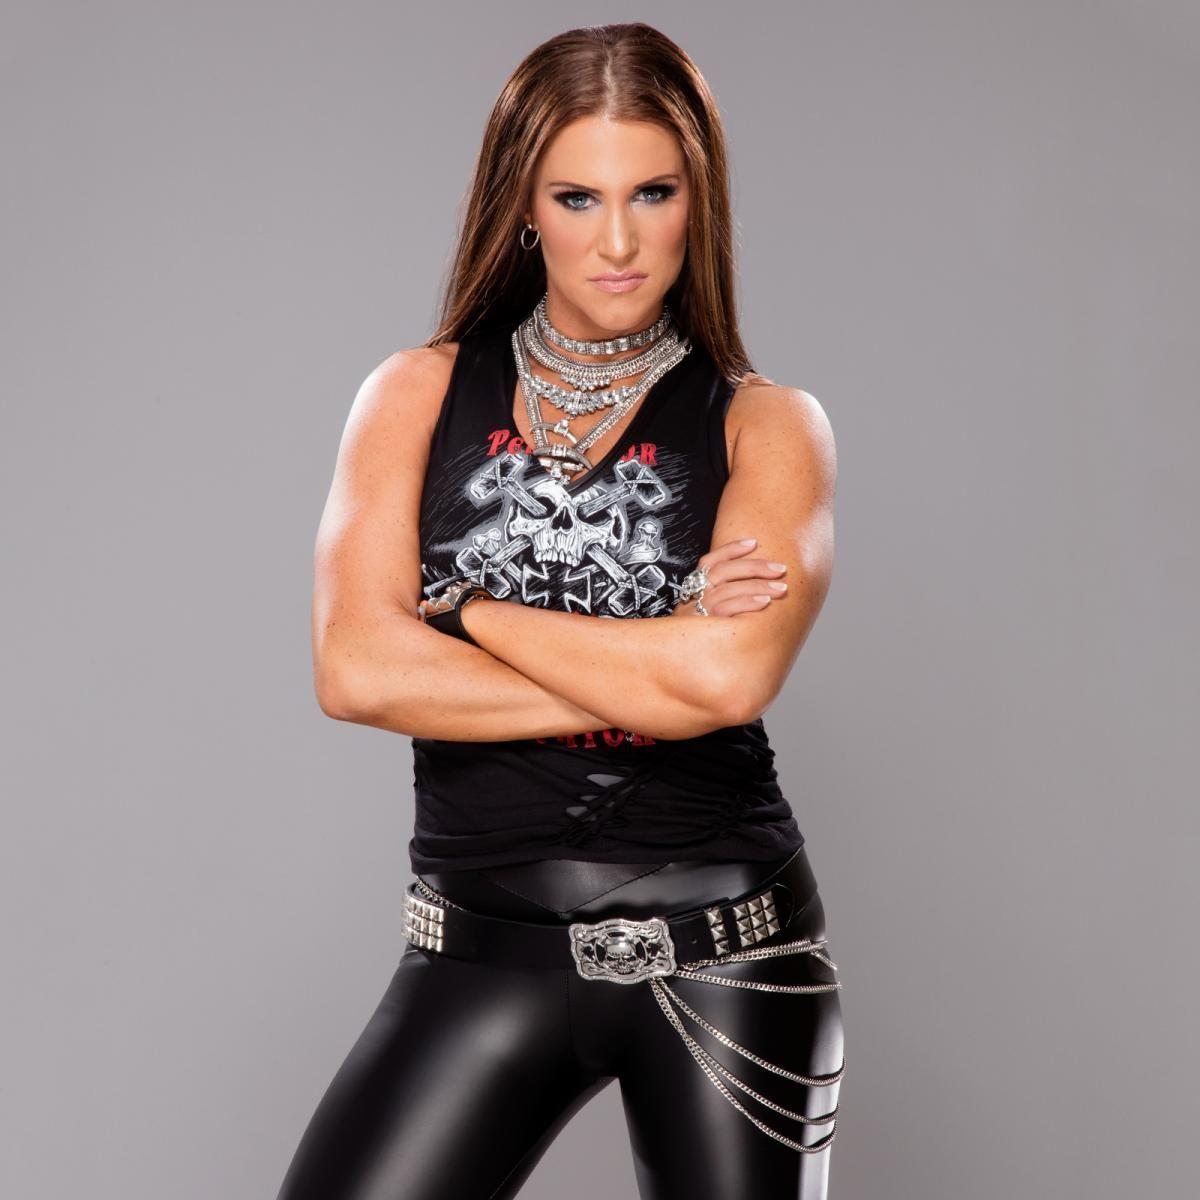 Photos Wrestlemania 33 S Coolest Ring Gear Stephanie Mcmahon